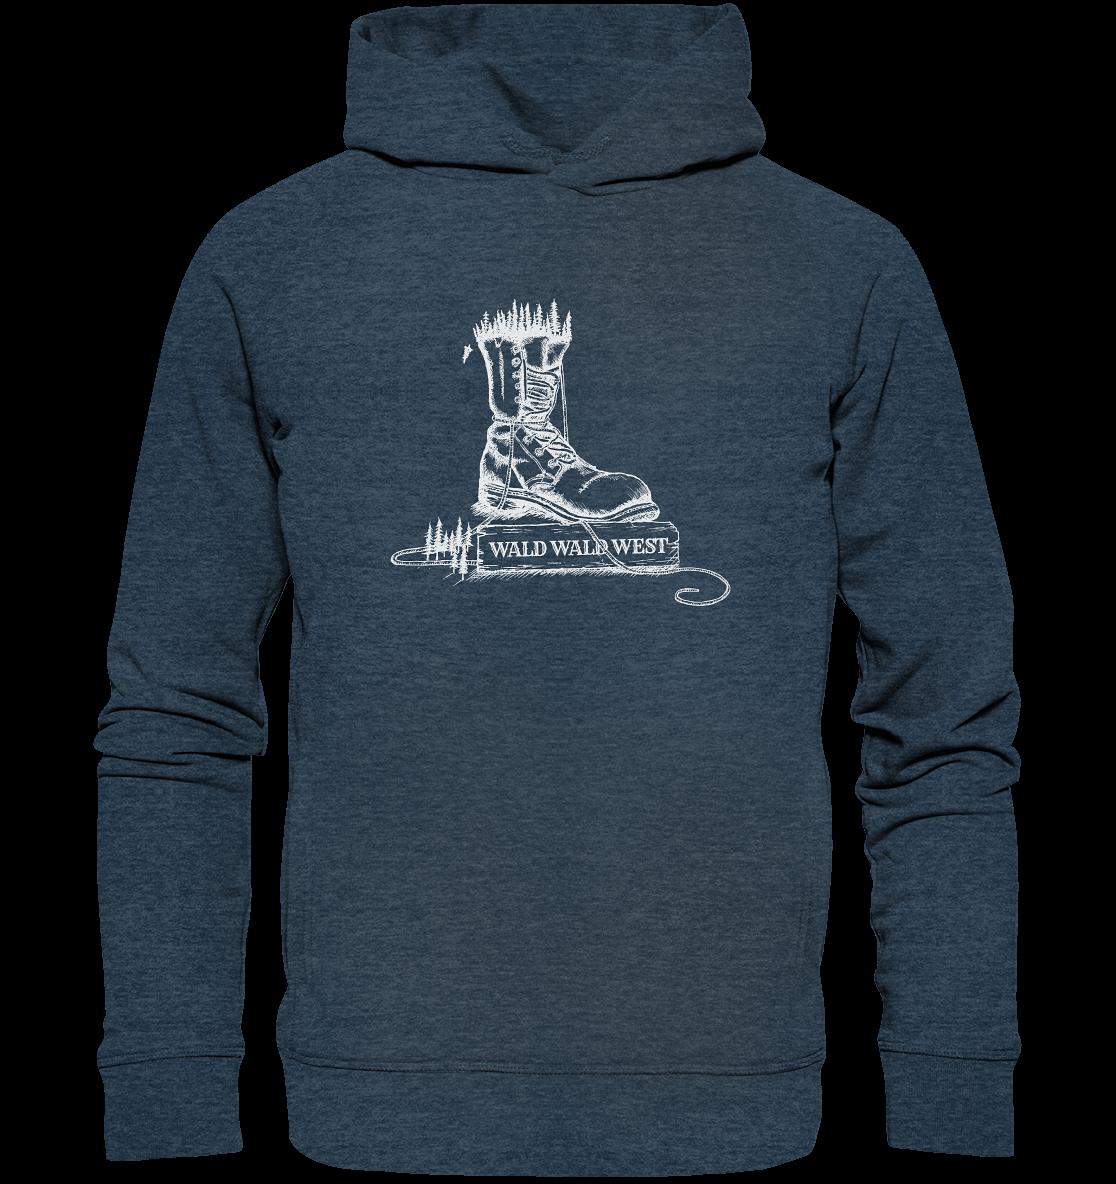 front-organic-fashion-hoodie-102940-1116x.png